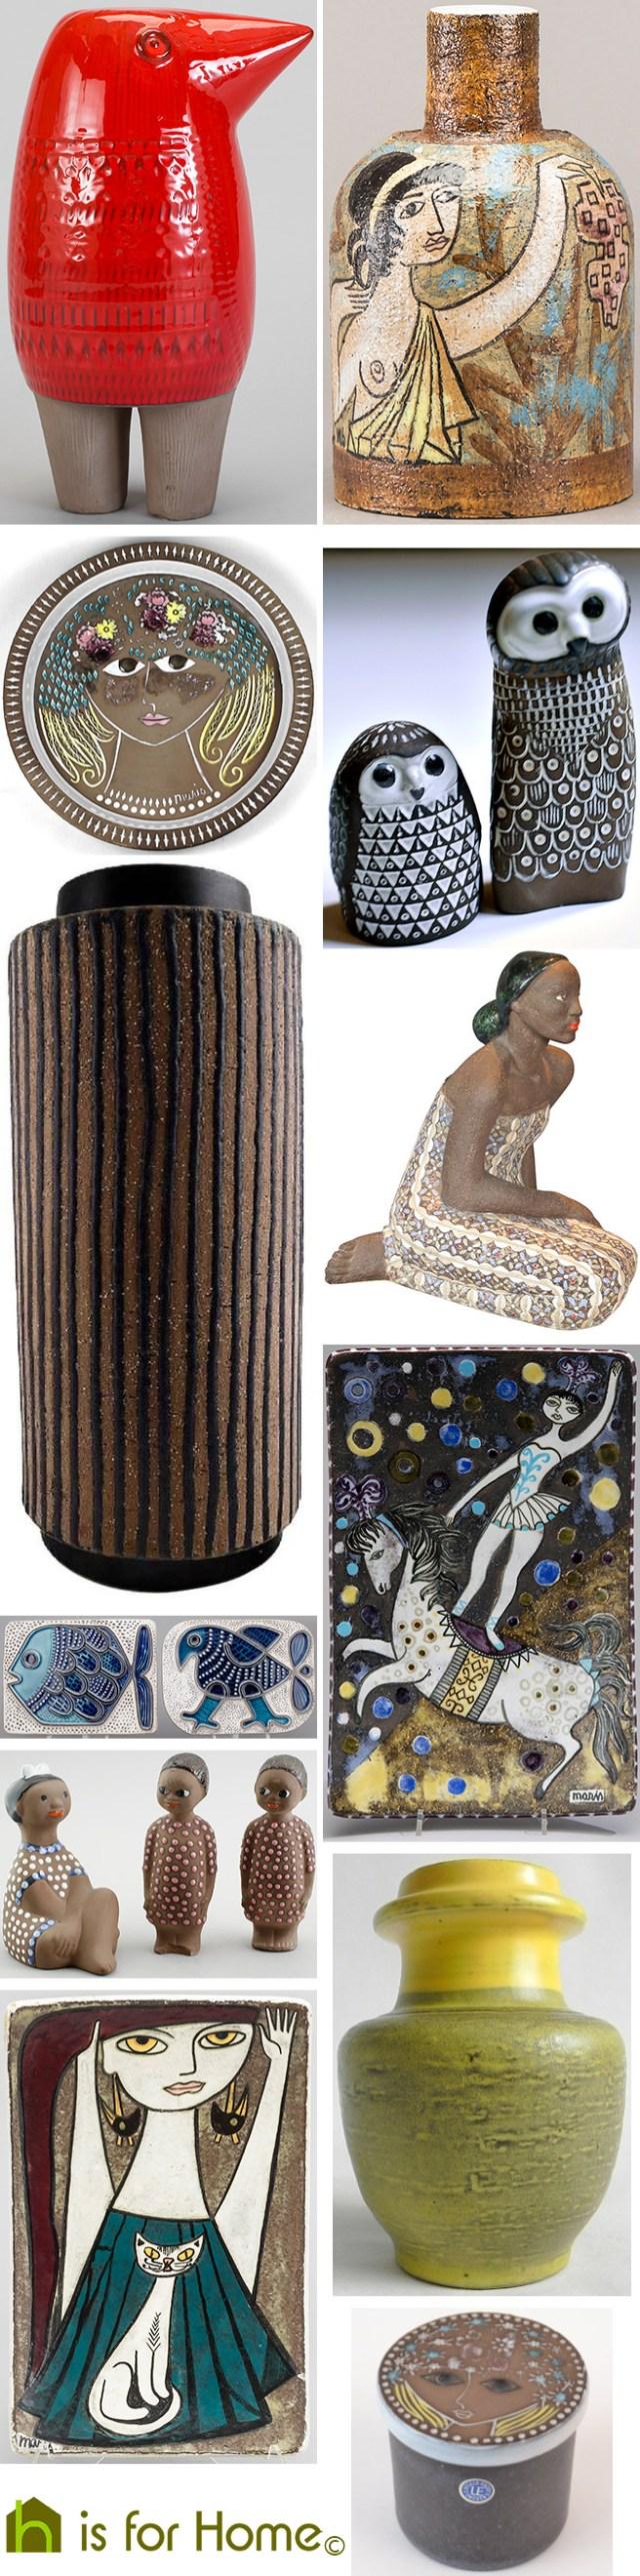 Mosaic of Mari Simmulson designs | H is for Home